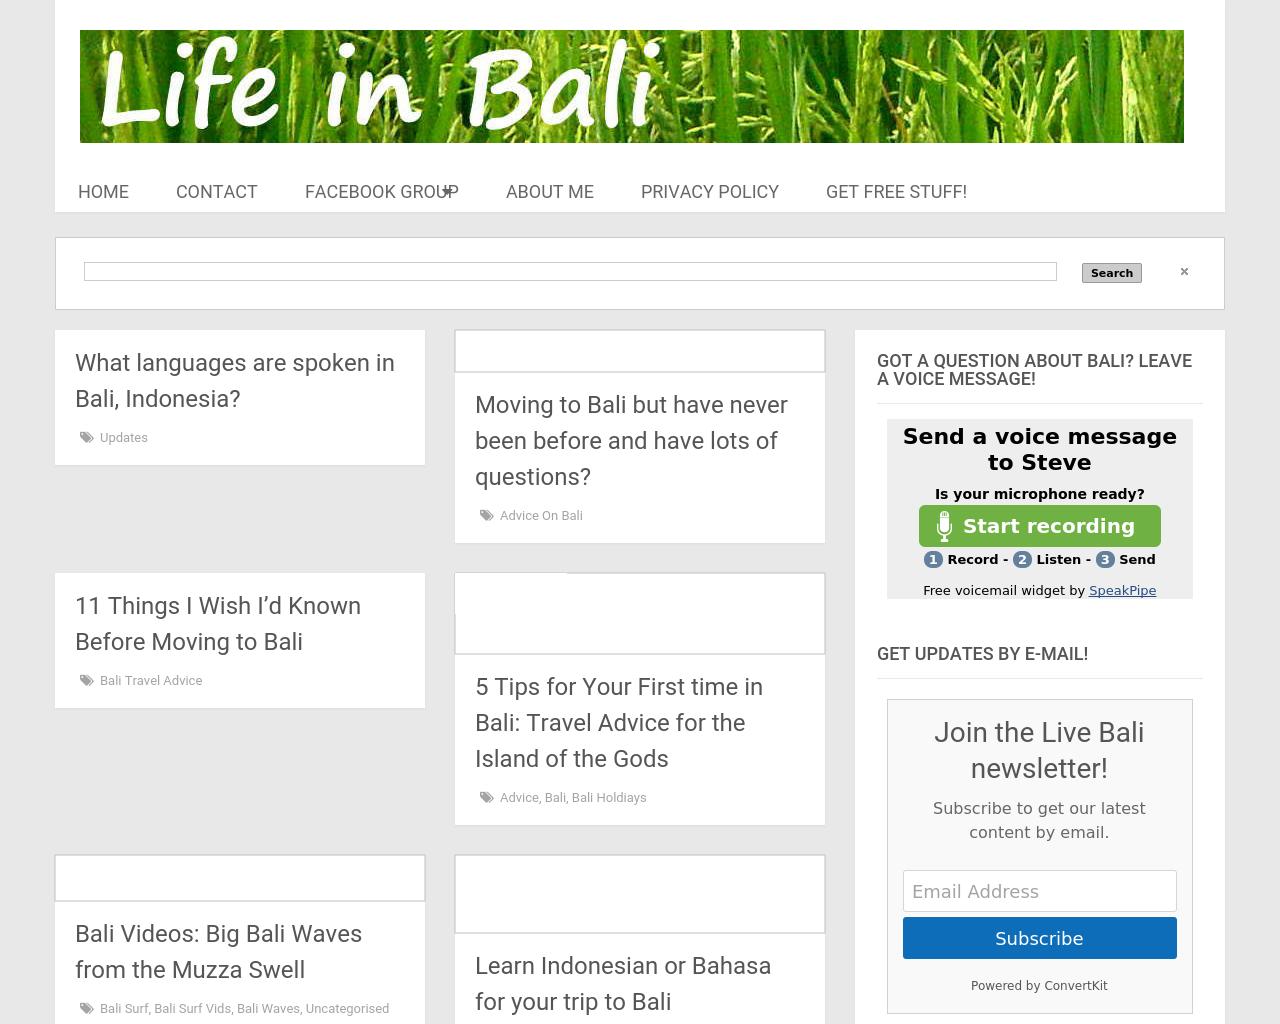 Life-In-Bali-Advertising-Reviews-Pricing